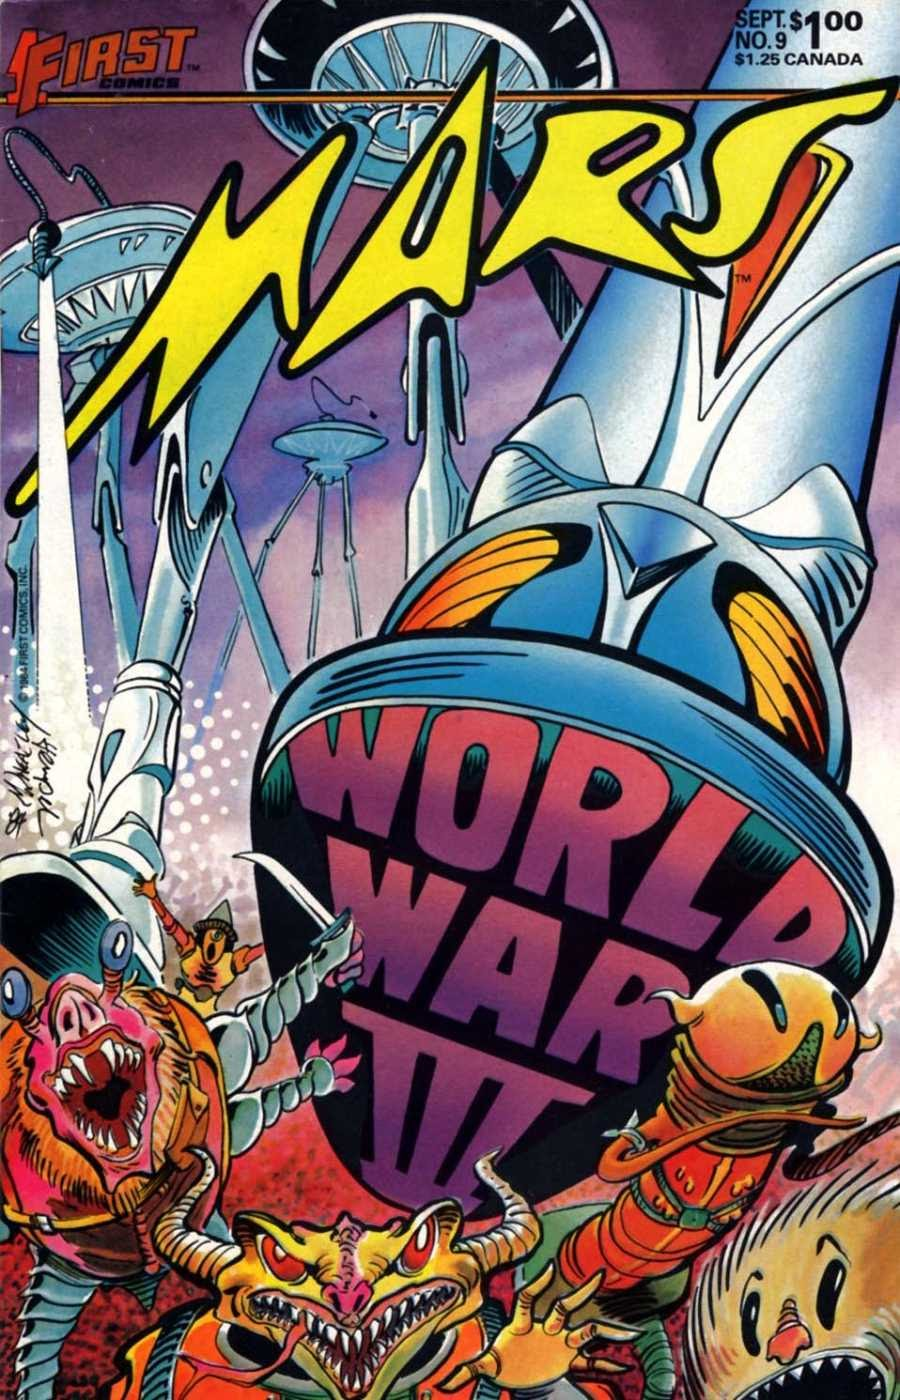 Read online Mars comic -  Issue #9 - 1